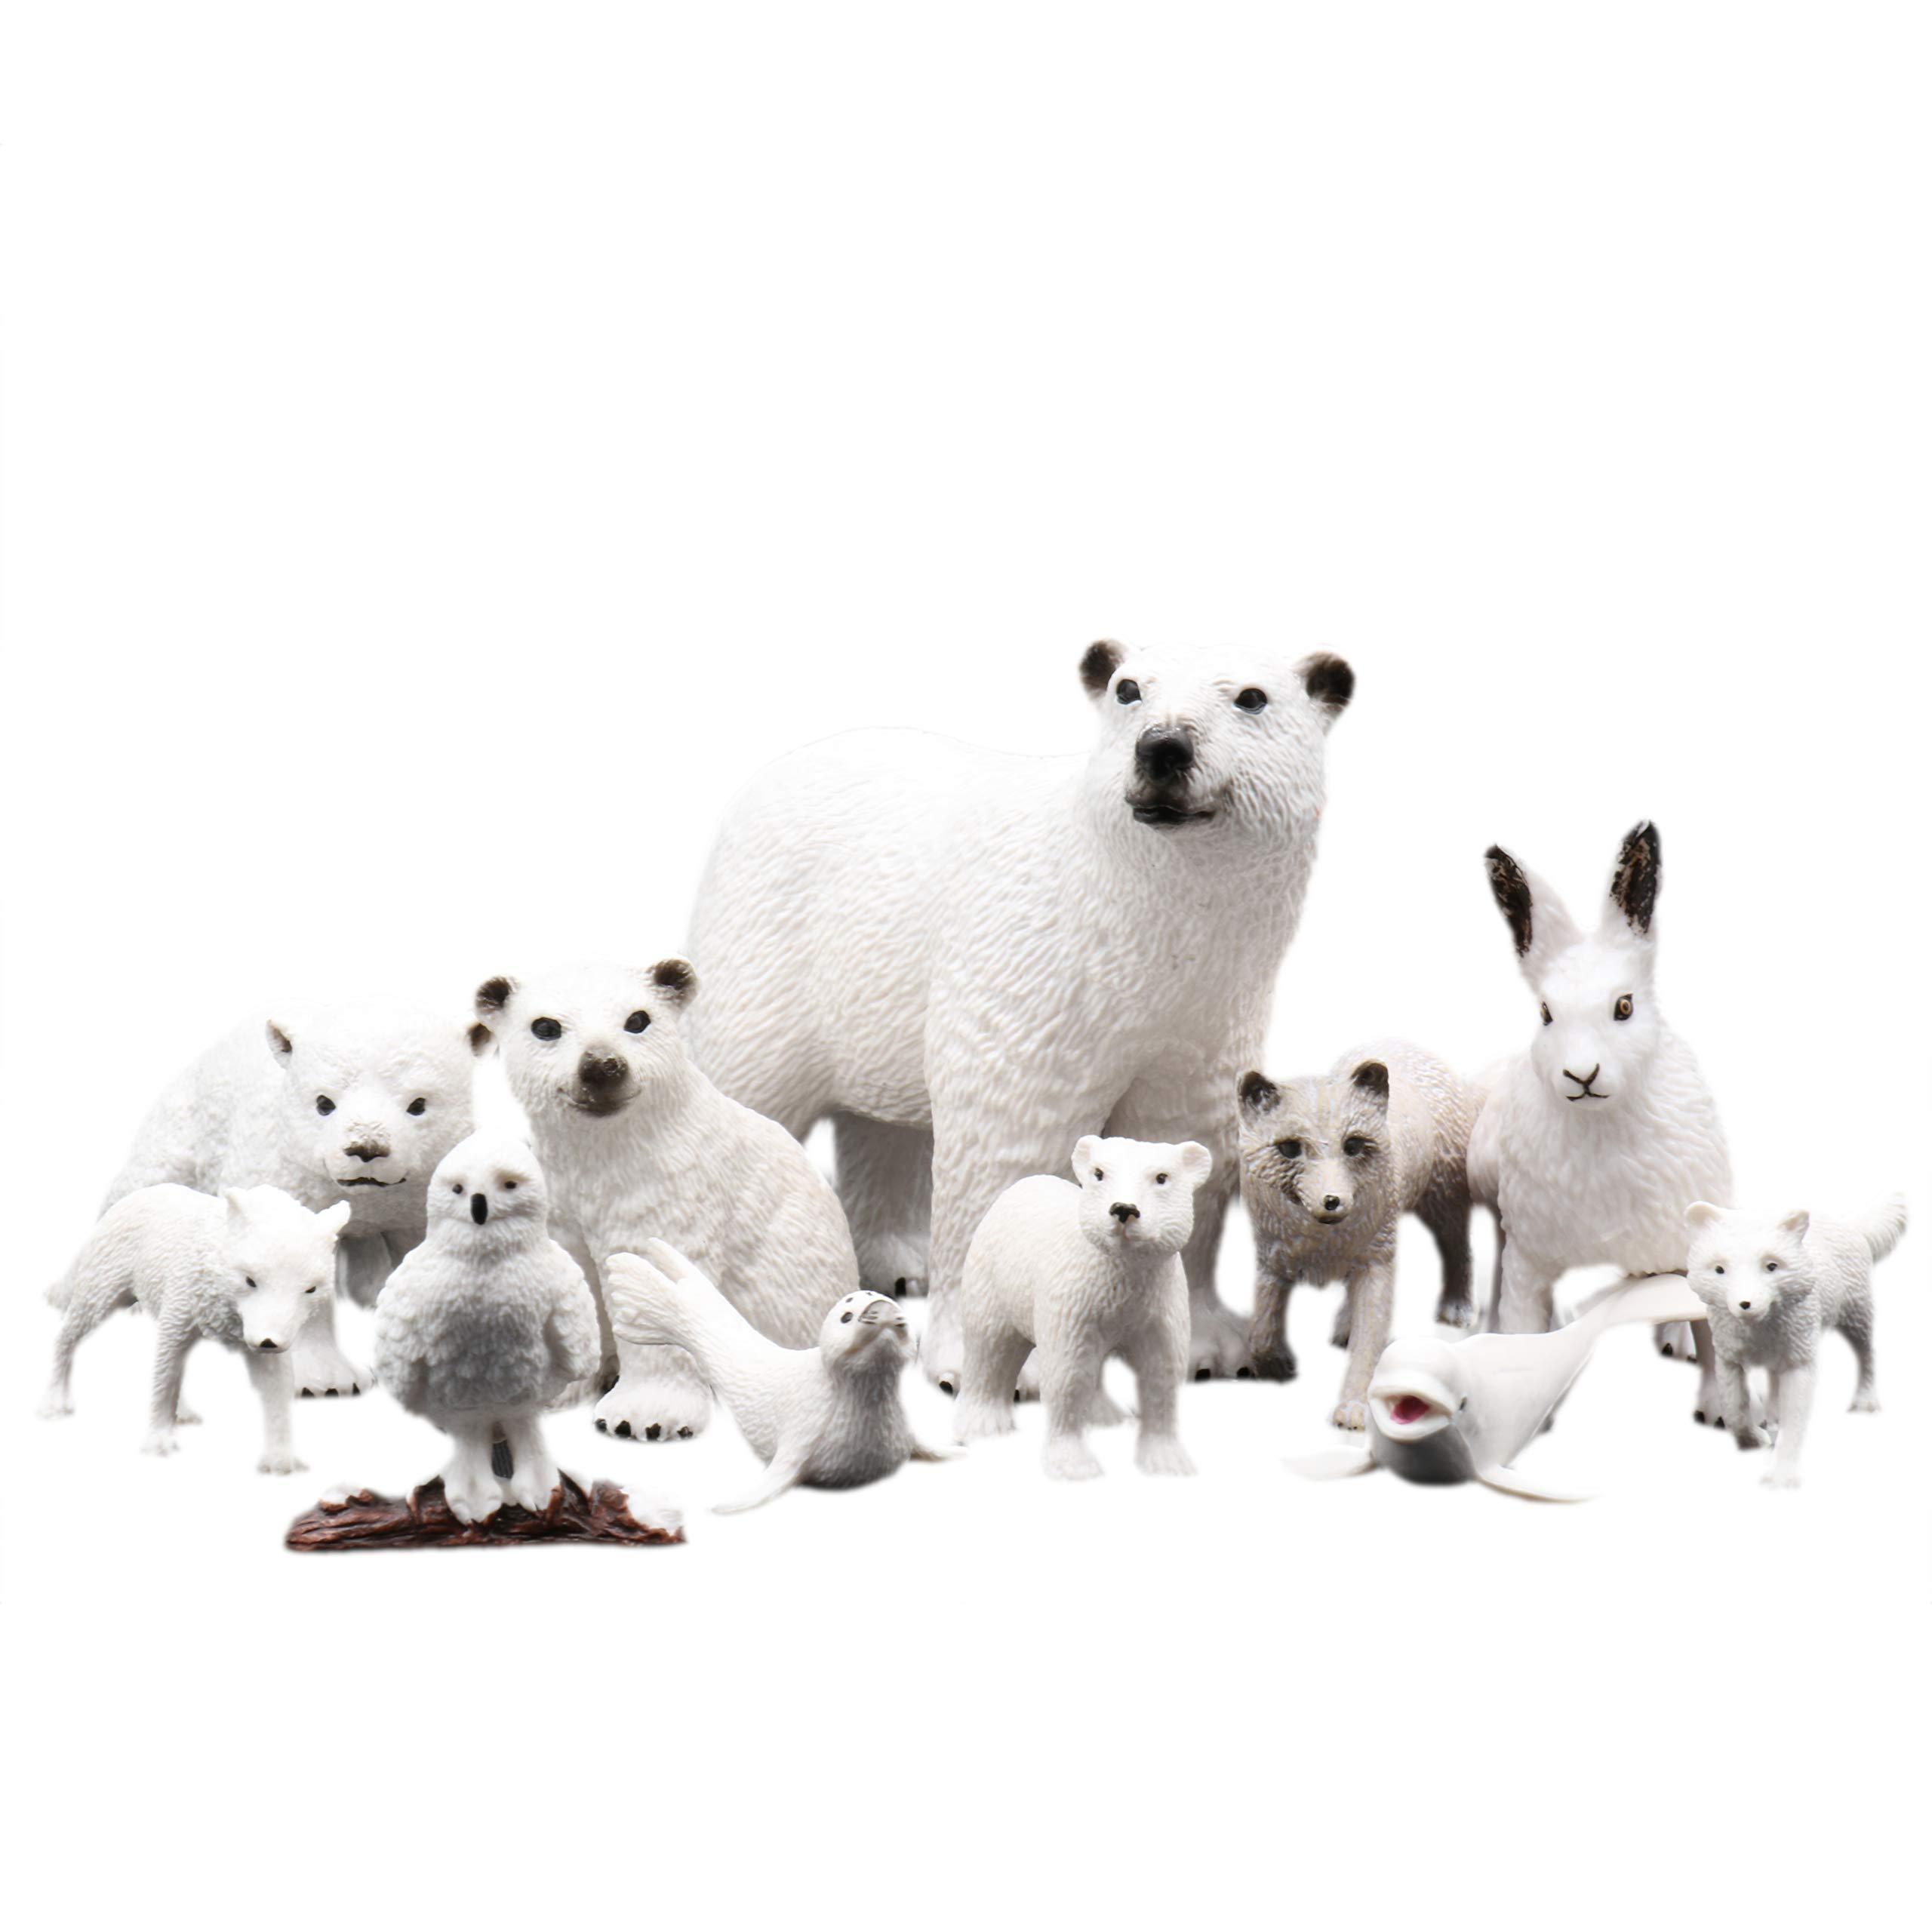 TMORU All White Animal Figurines Toys, Polar Bear Educational Preschool Christmas Birthday Gift Cake Toppers for Kids, Set of 11